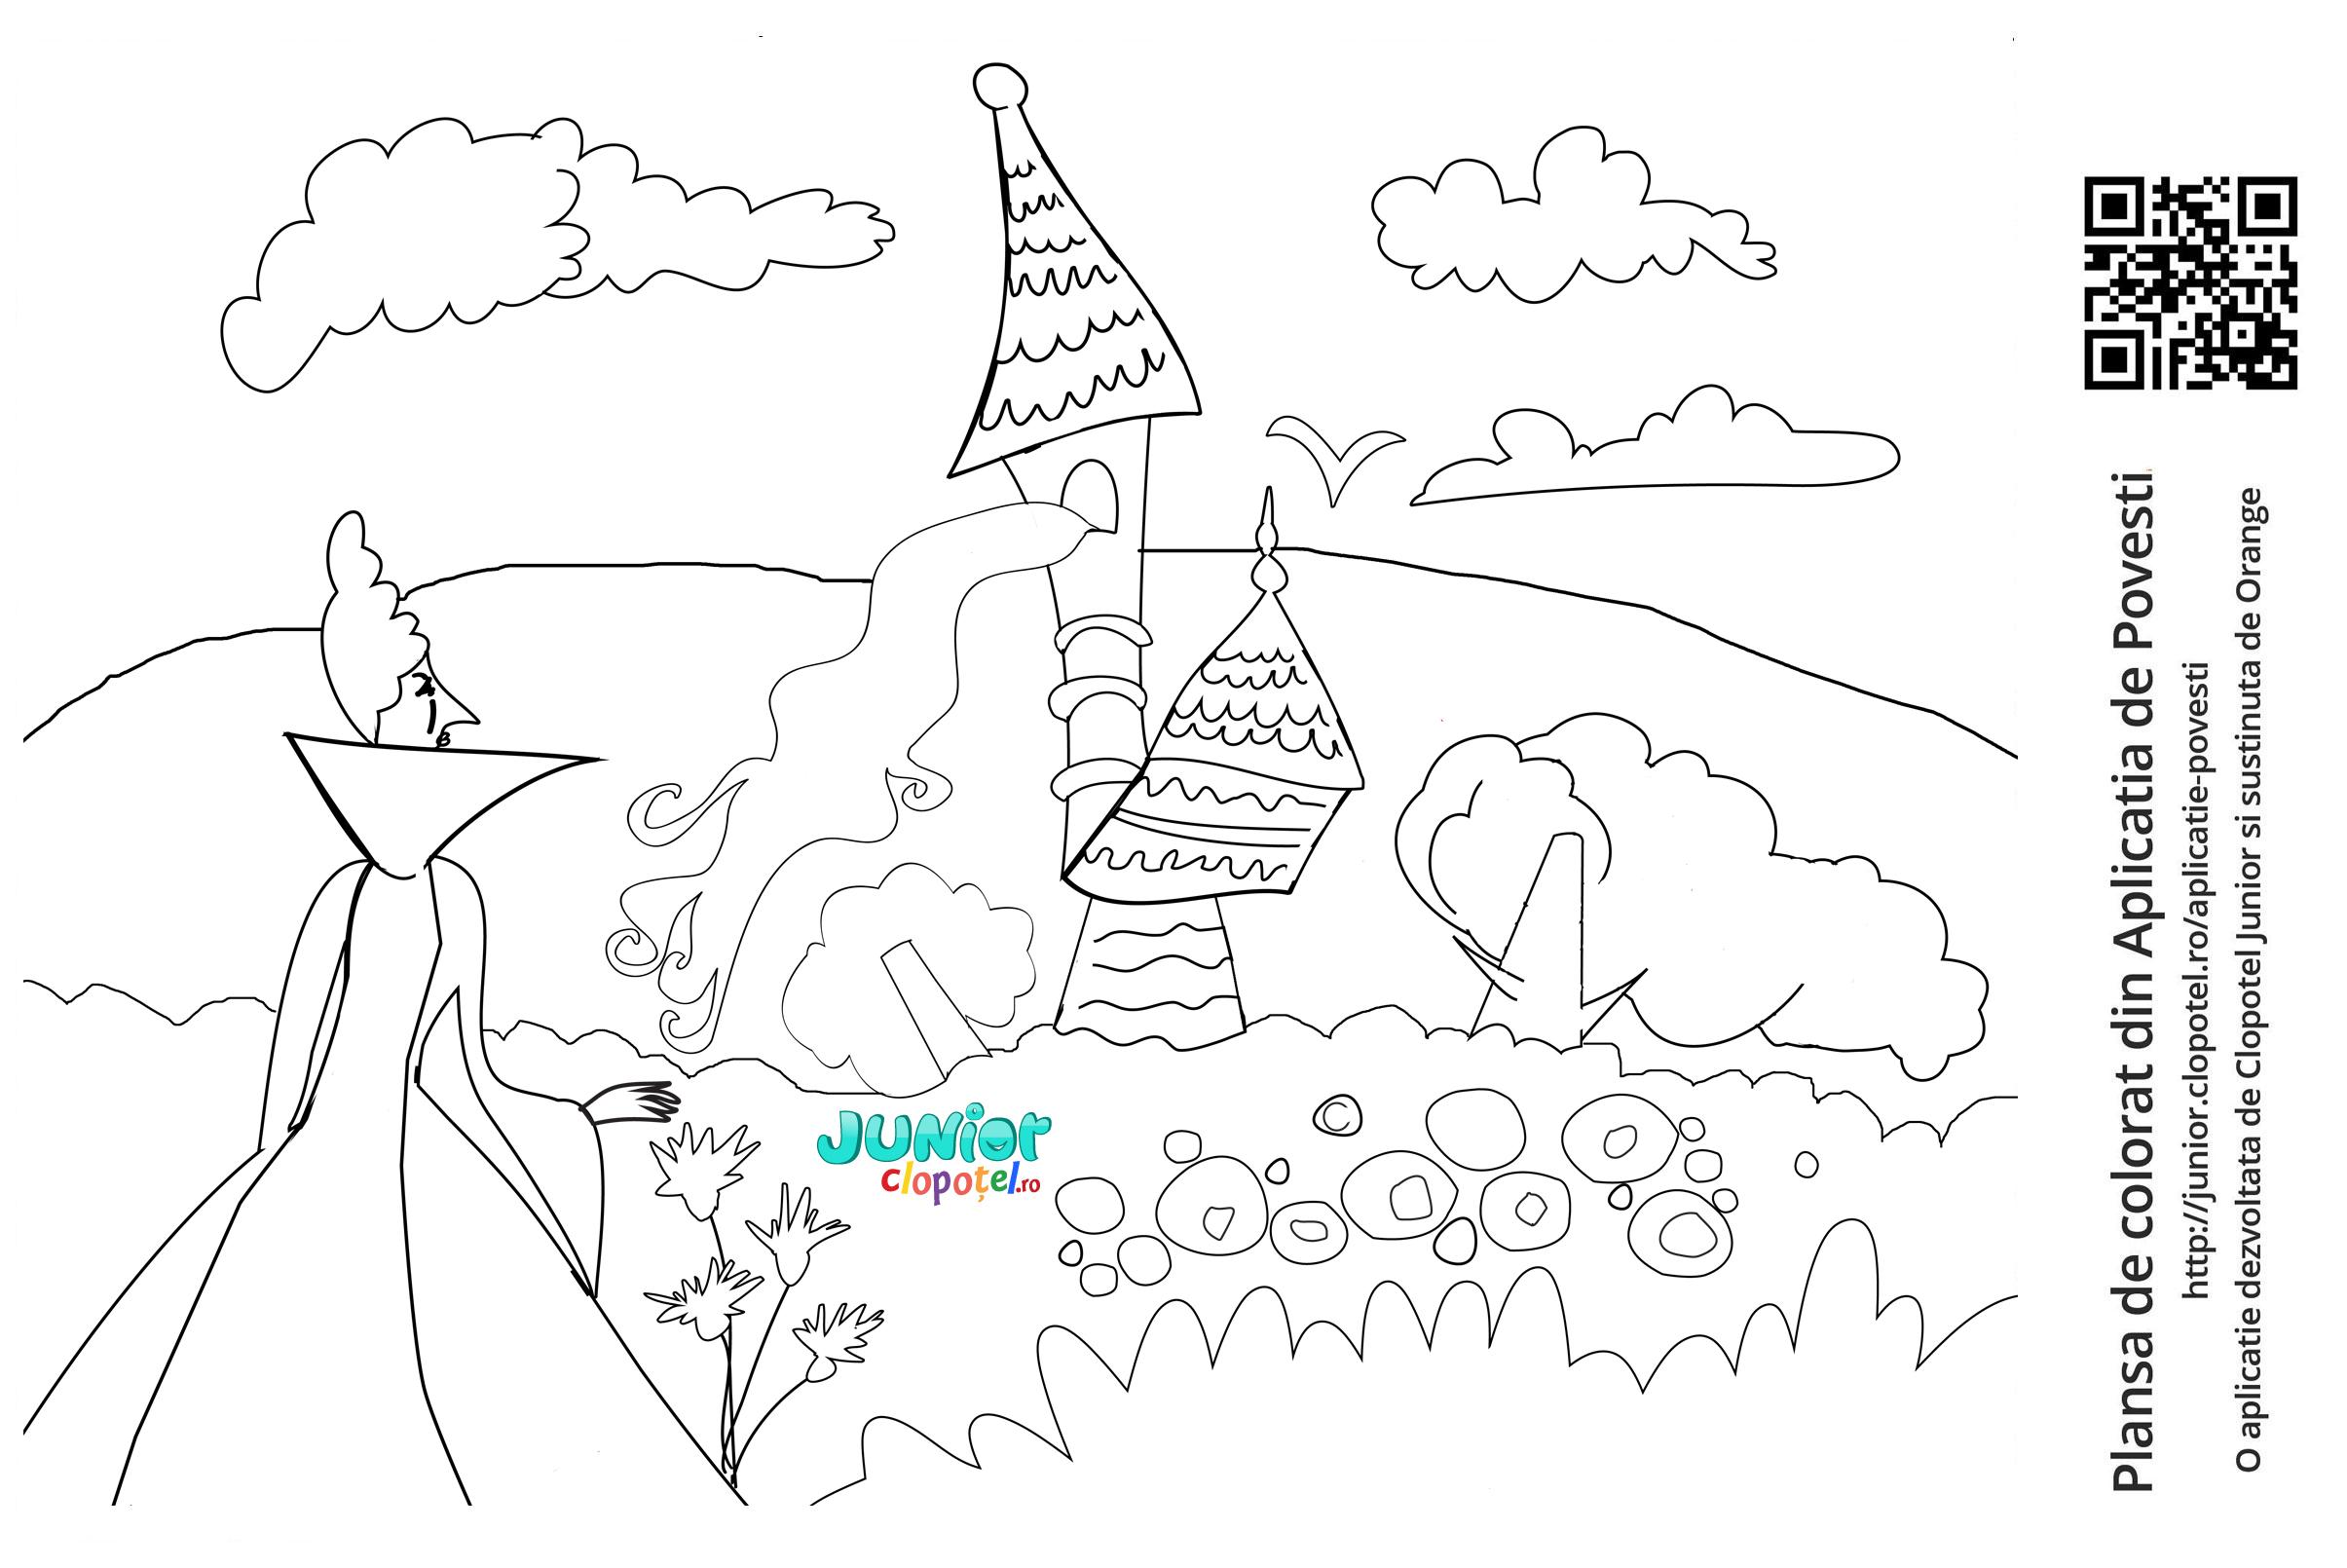 Rapunzel isi scoate parul din turn